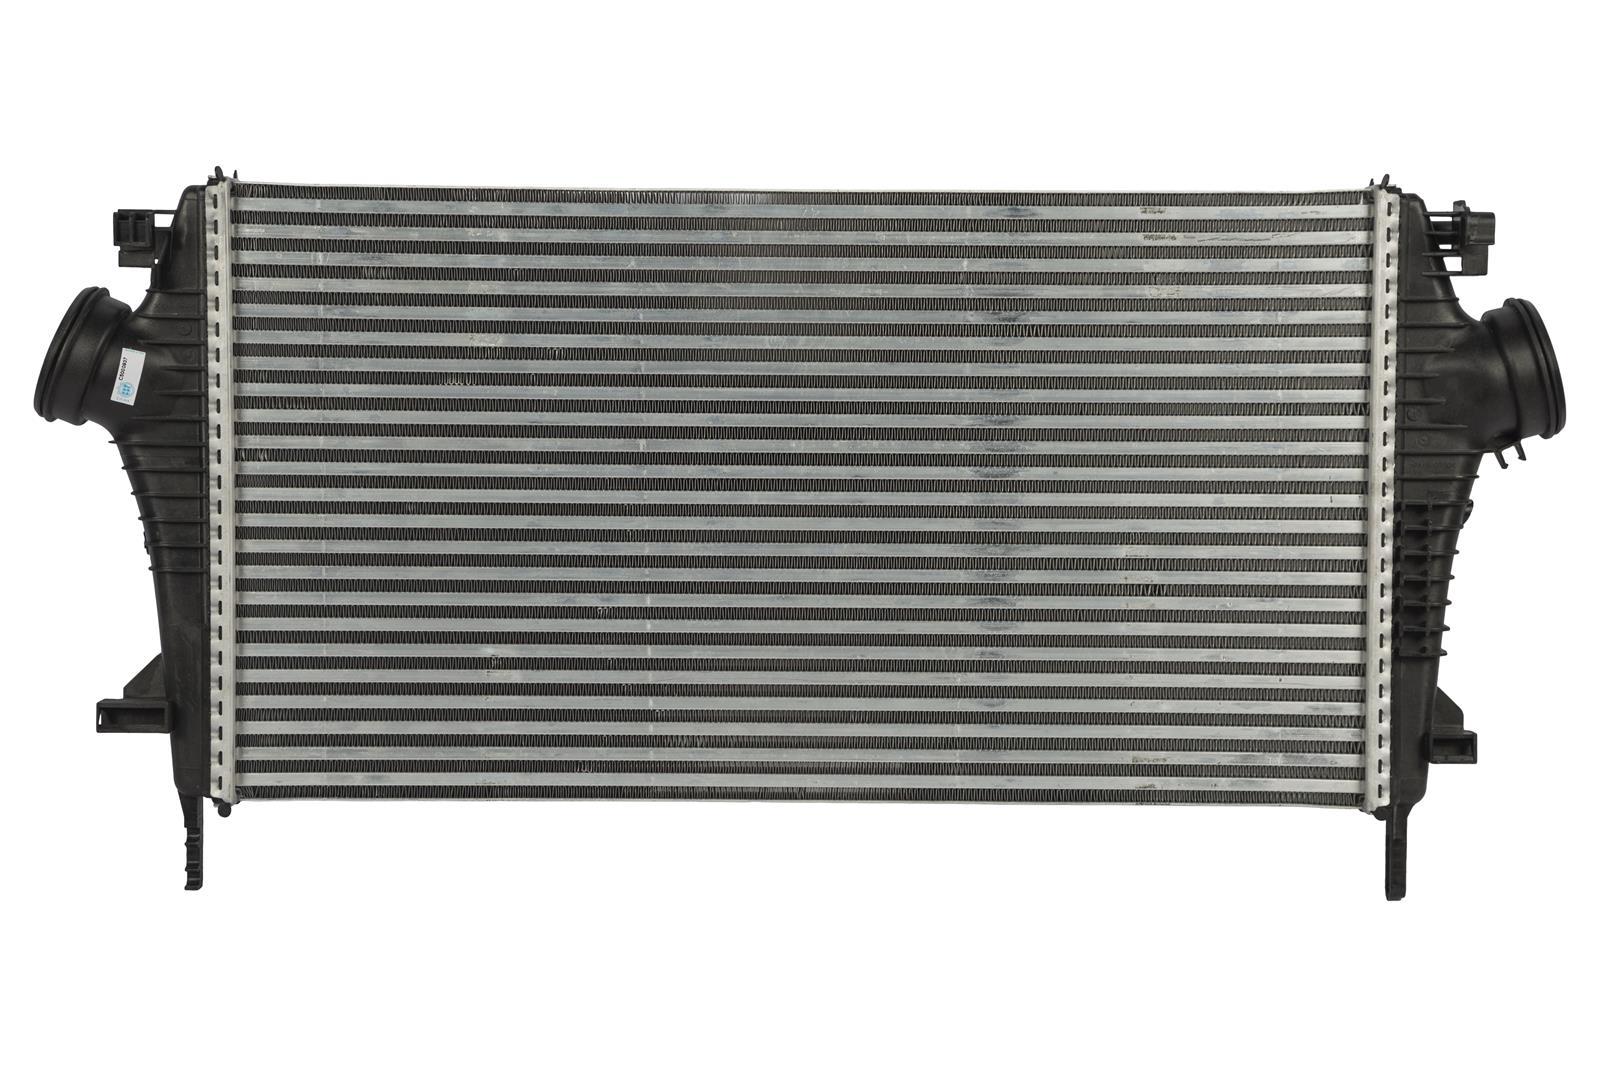 CSF 6005 Replacement Intercooler